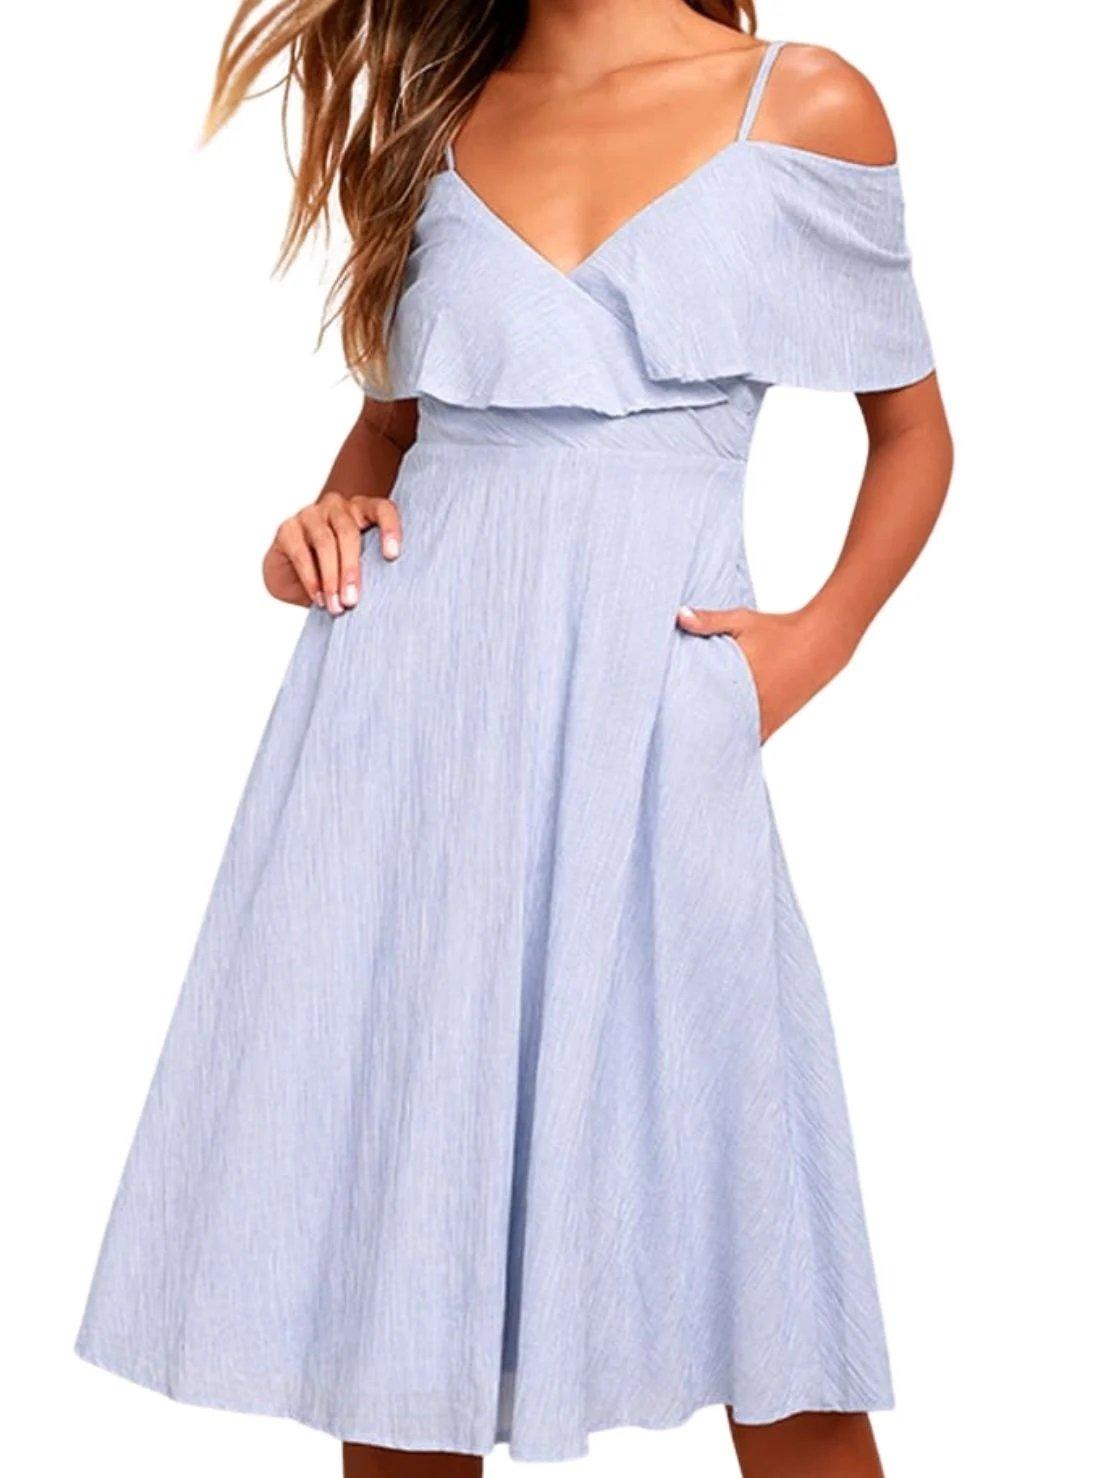 Striped Off-the-Shoulder Summer Midi Dress